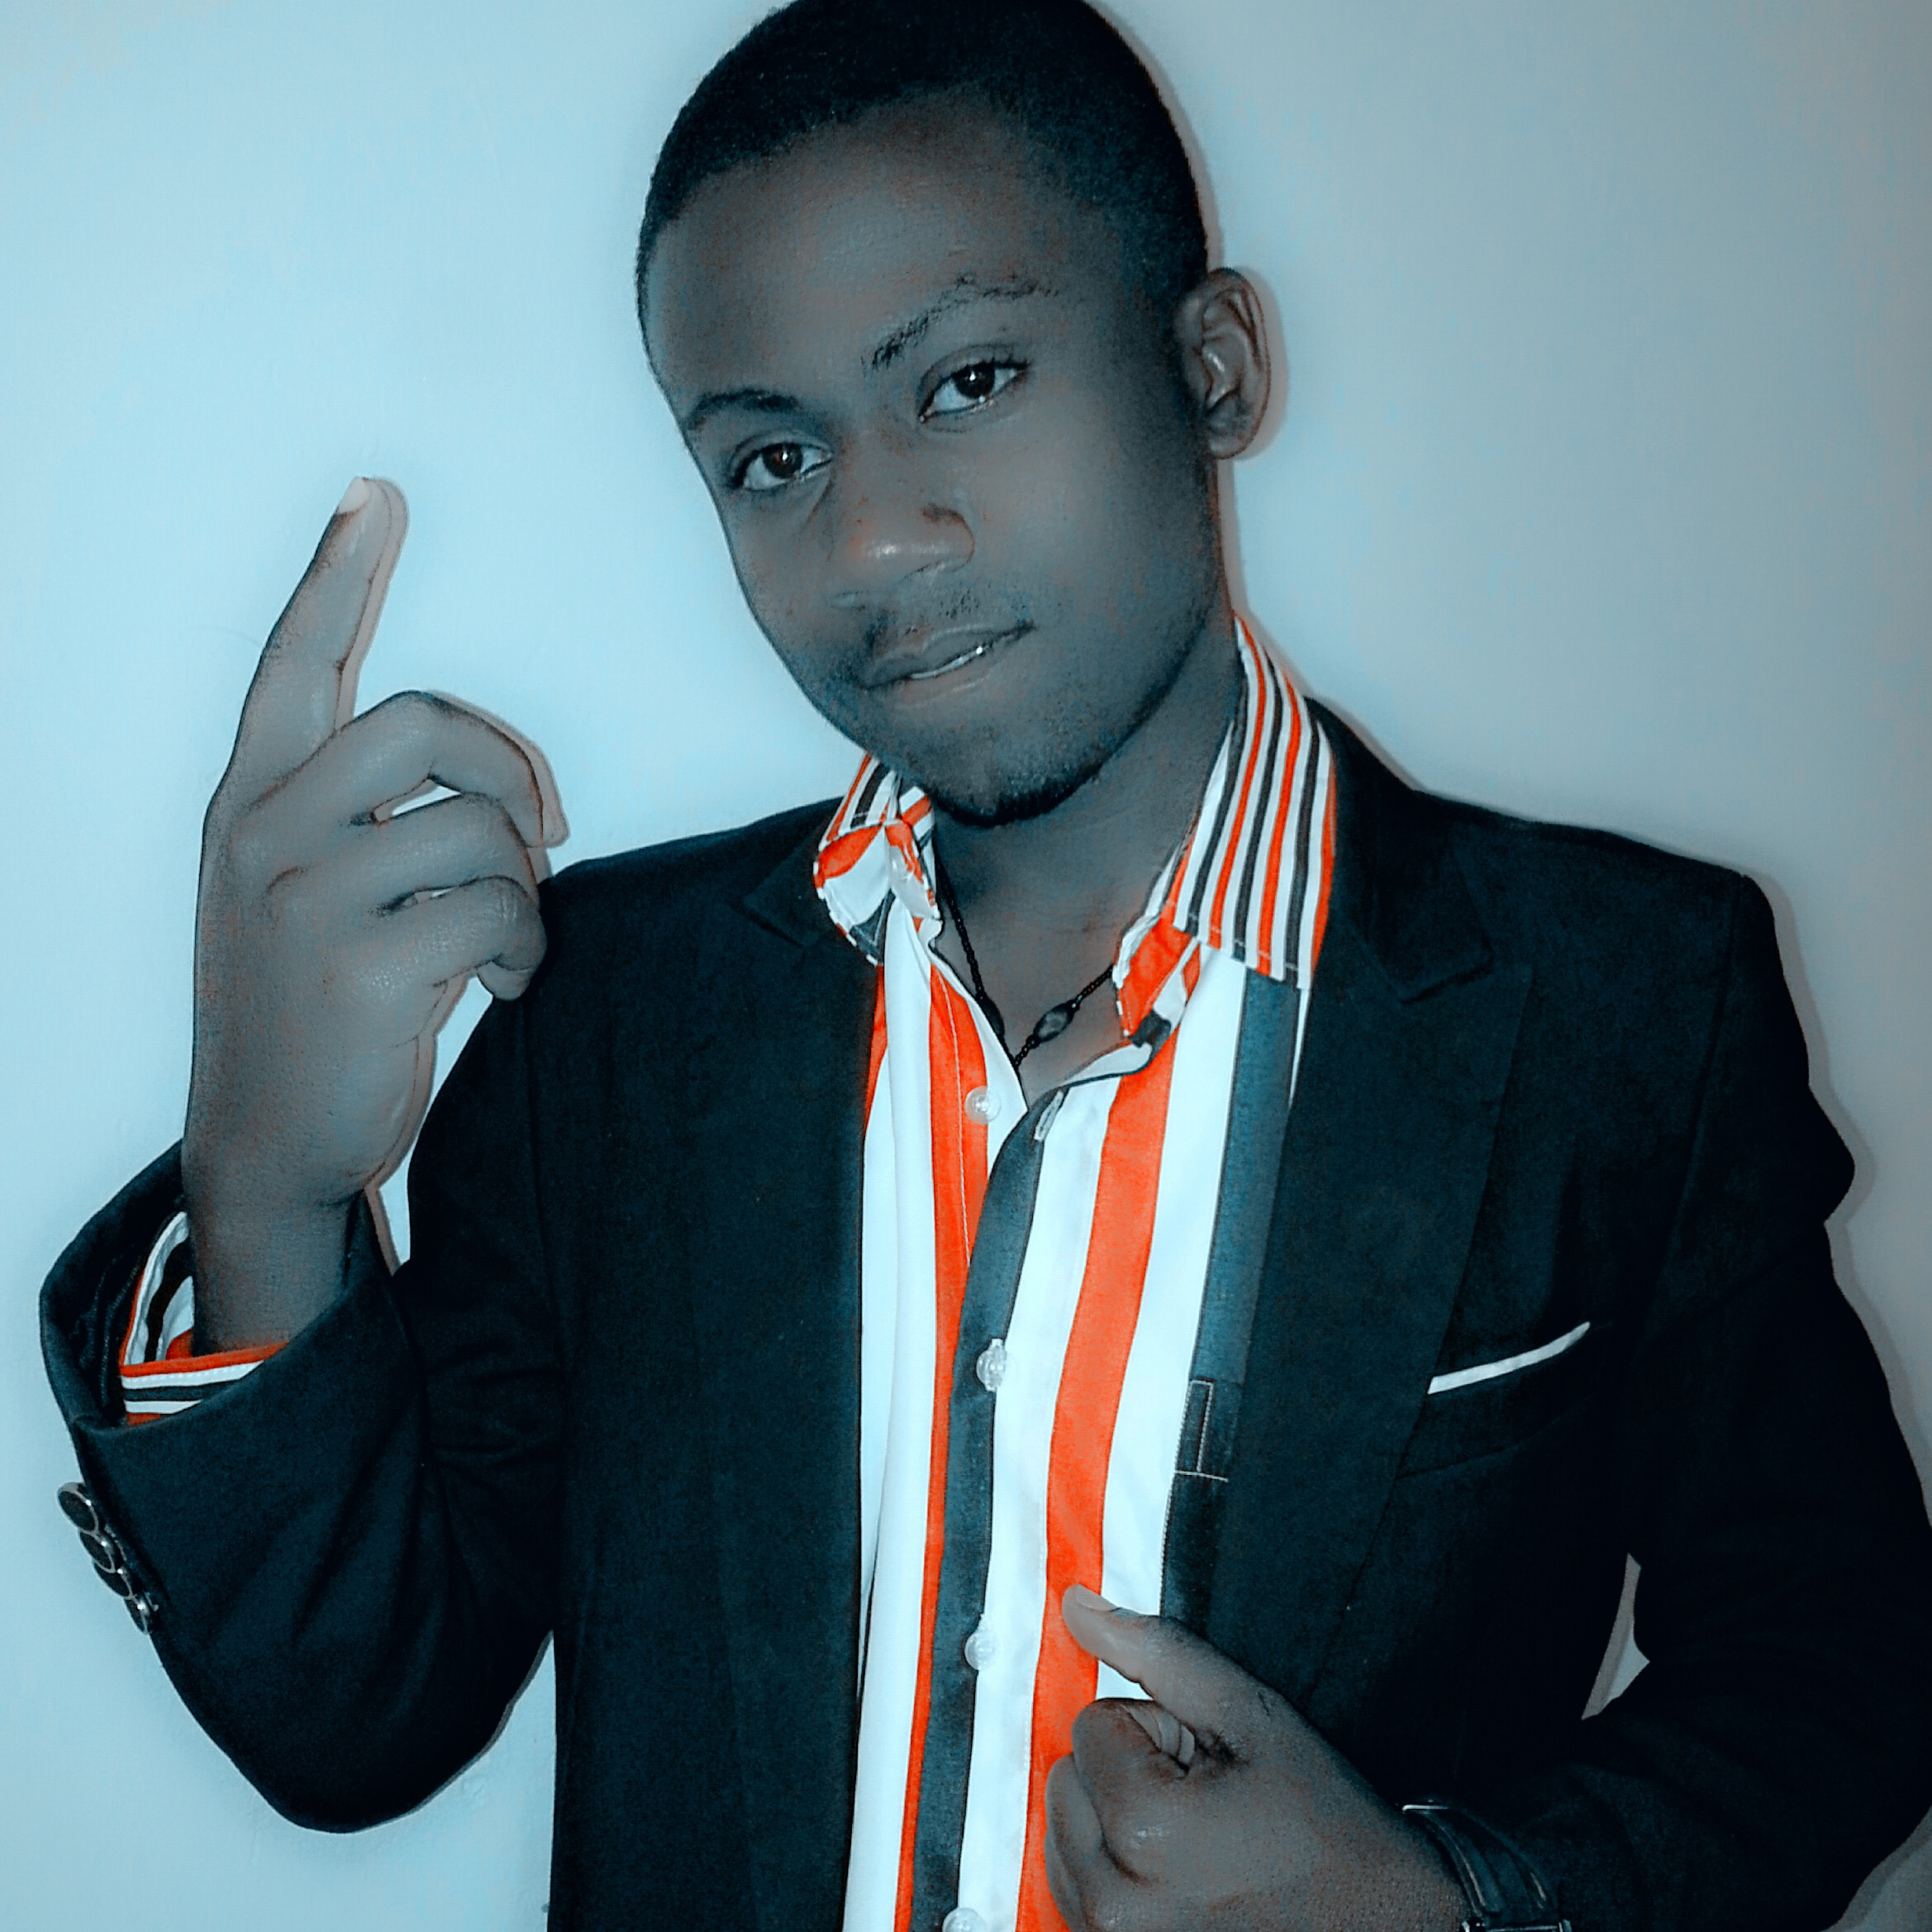 DR. TEMBA - (One day)Nichanganye